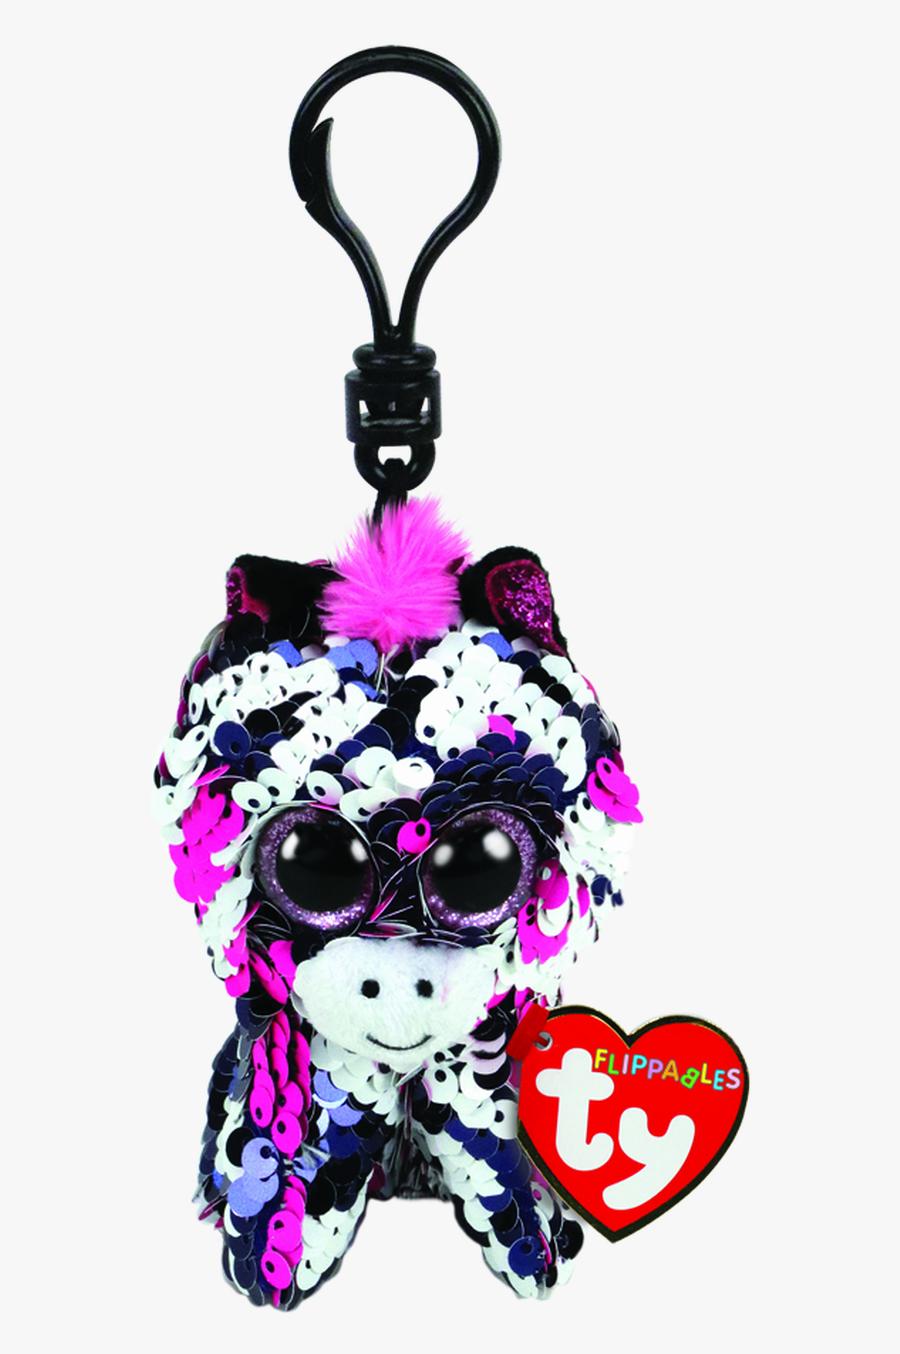 Ty Beanie Boo Flippables Clip Zoey Zebra - Zoey Zebra Beanie Boos, Transparent Clipart